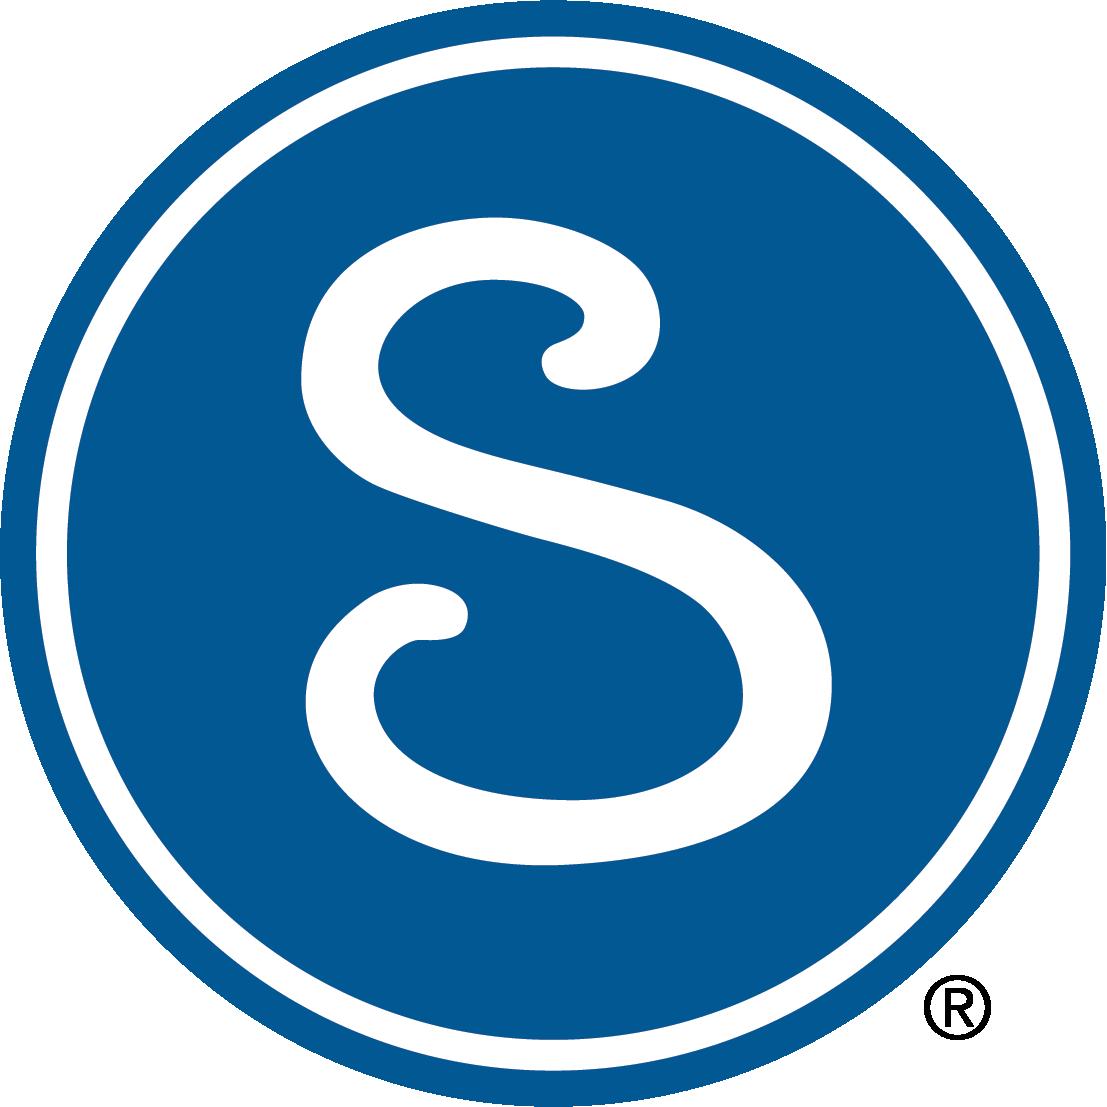 logo-swagelok-icon